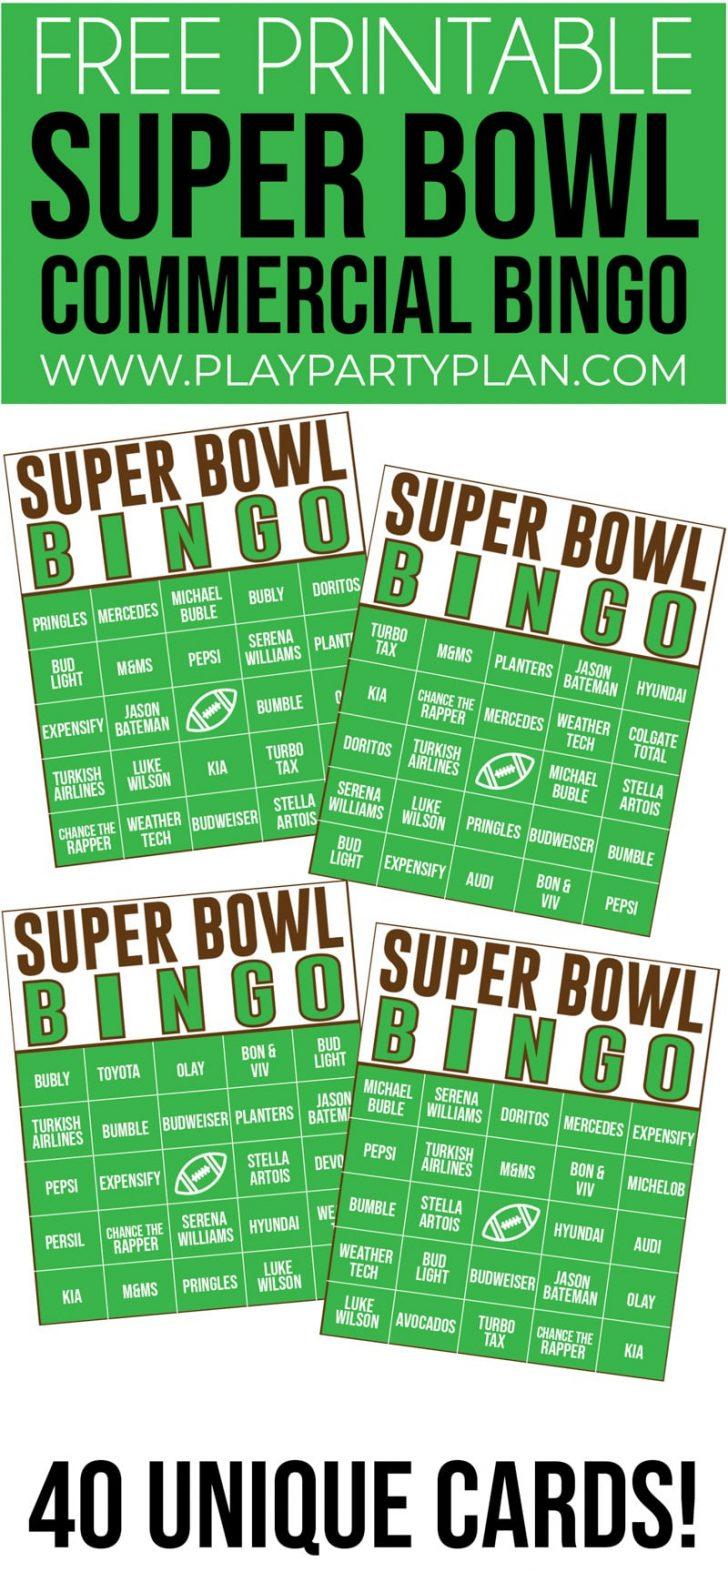 Superbowl Commercial Bingo Cards Free Printable